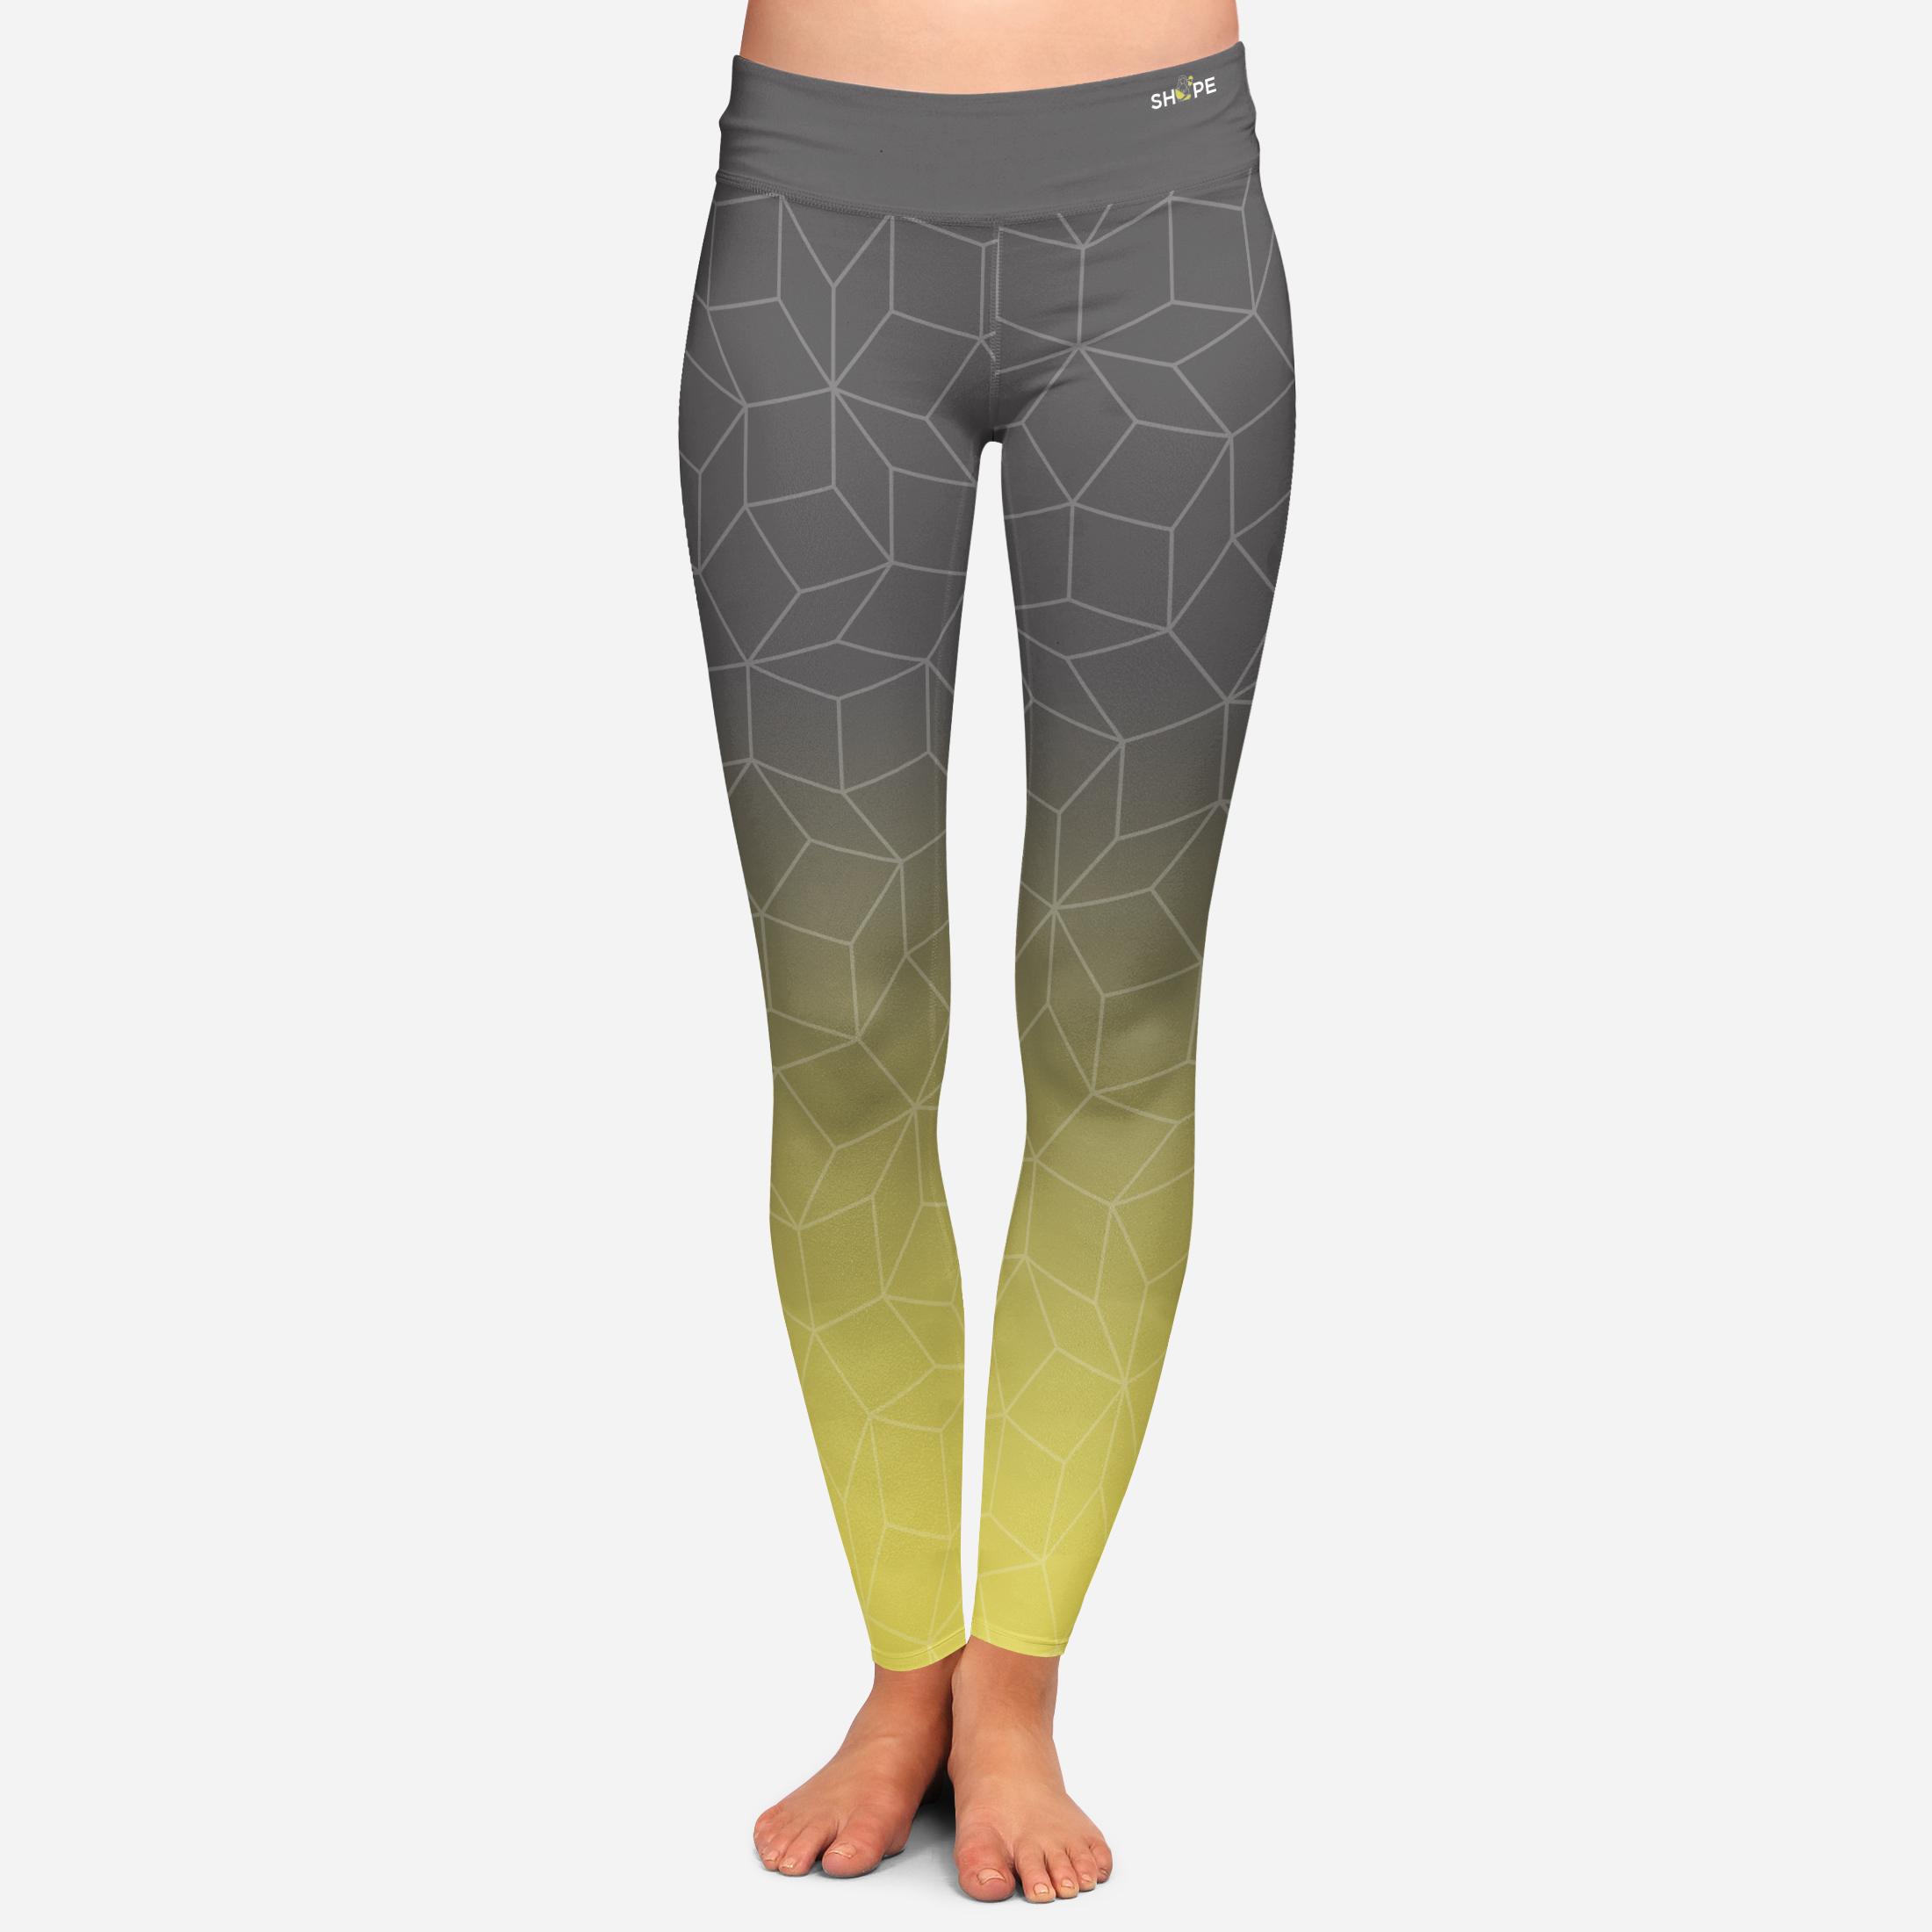 Legging Pant Design  [Electric Yellow/Phantom]